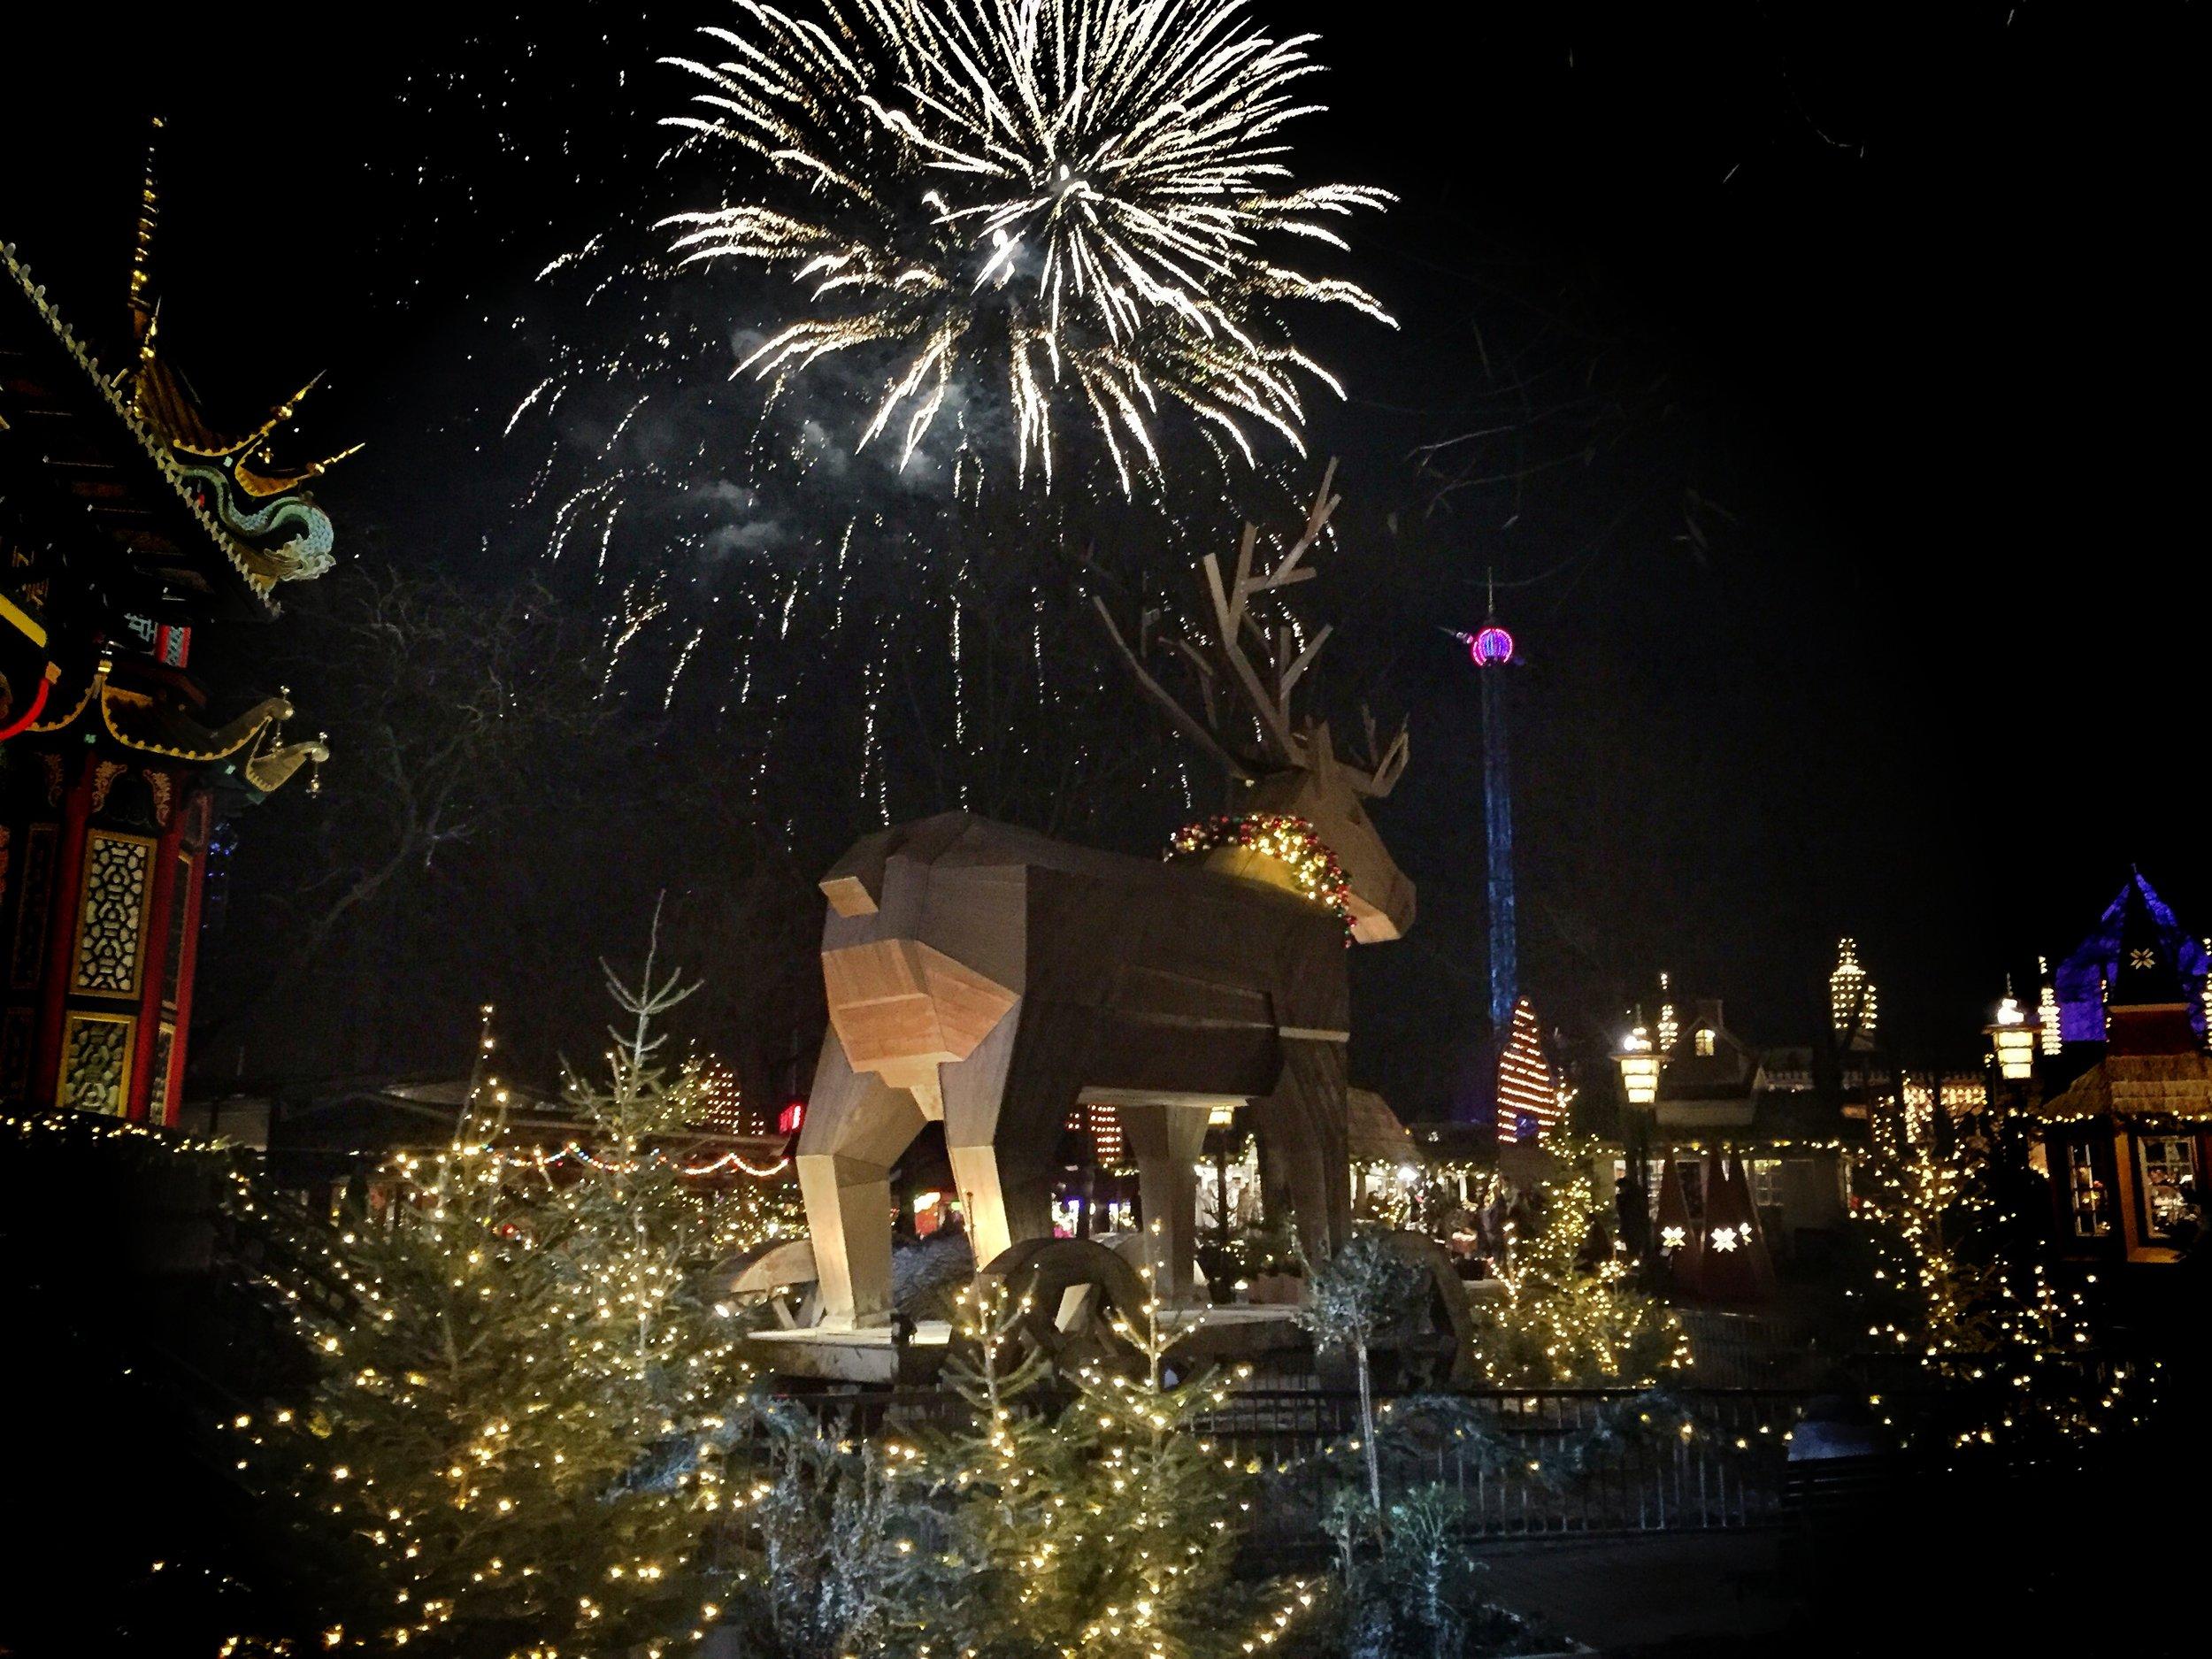 Nightly Fireworks at Tivoli